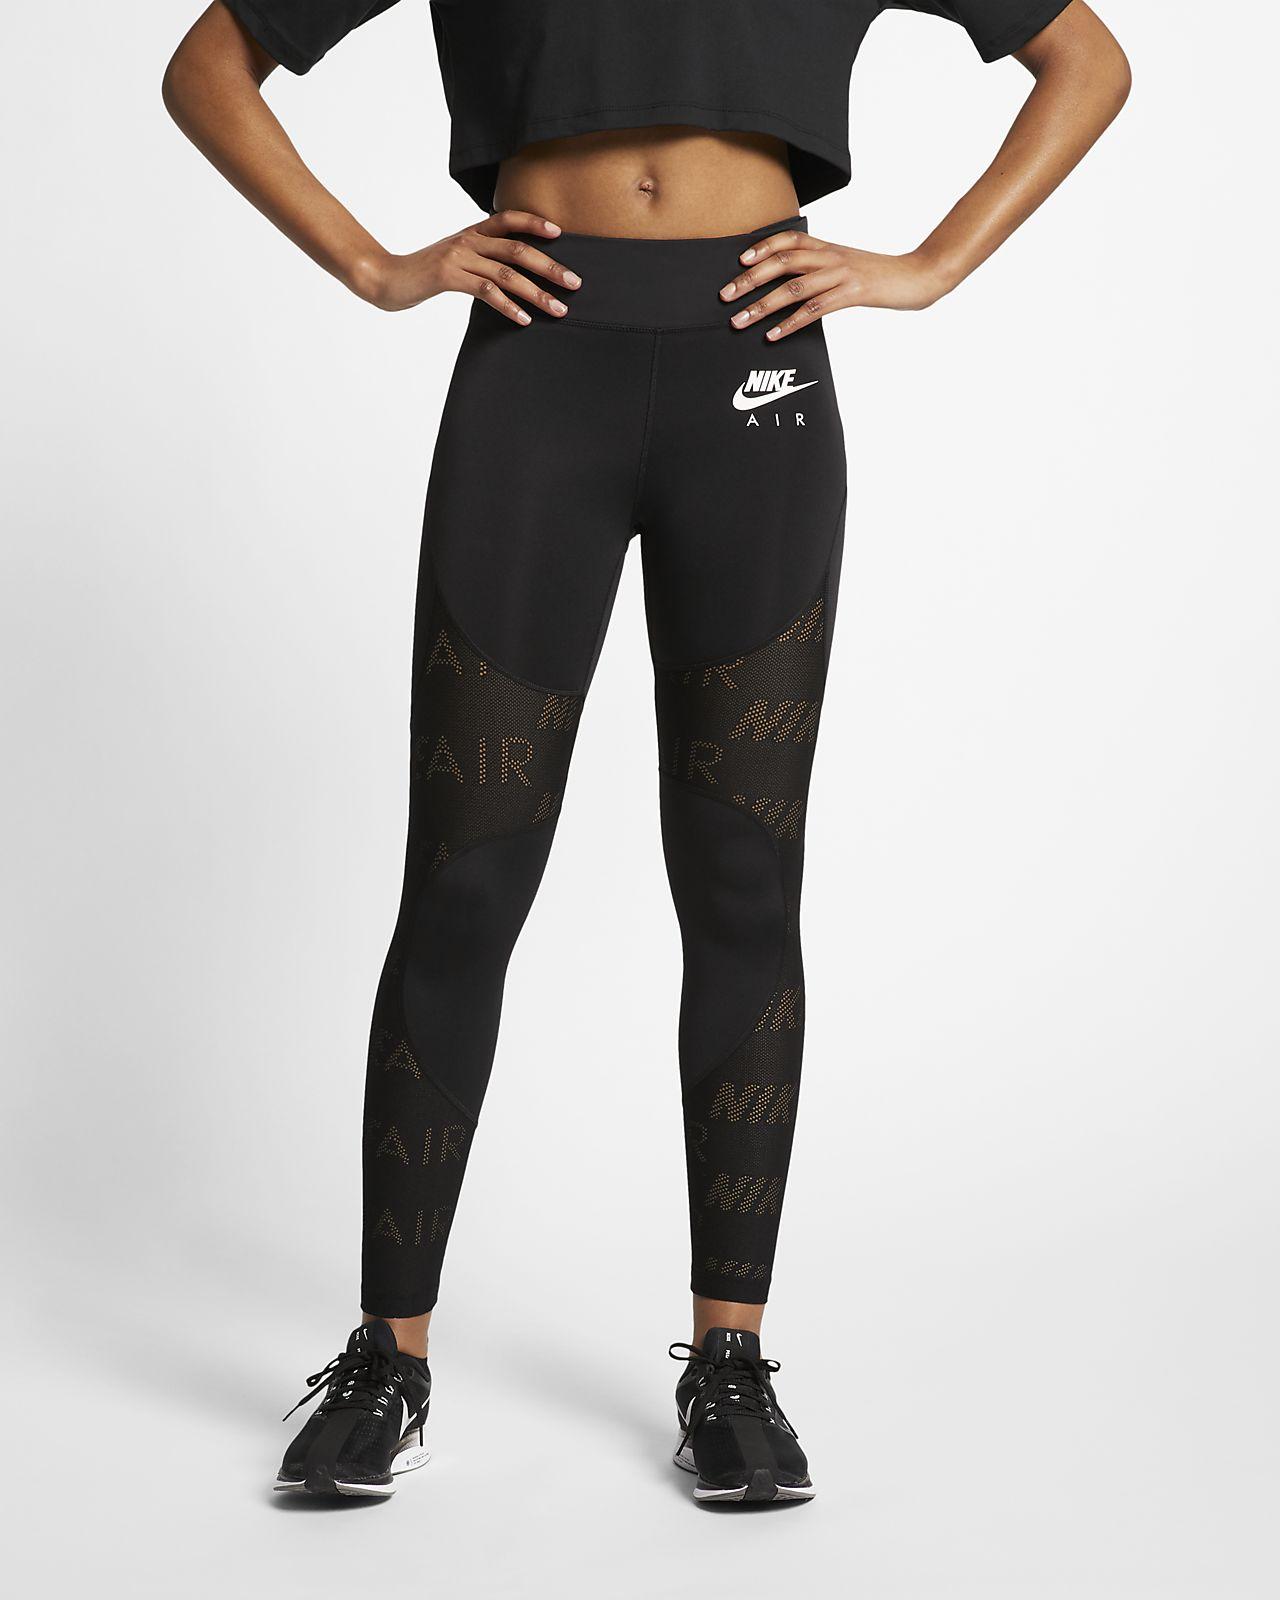 2fecf4e7a96 Γυναικείο κολάν 7/8 για τρέξιμο Nike Air Fast. Nike.com GR